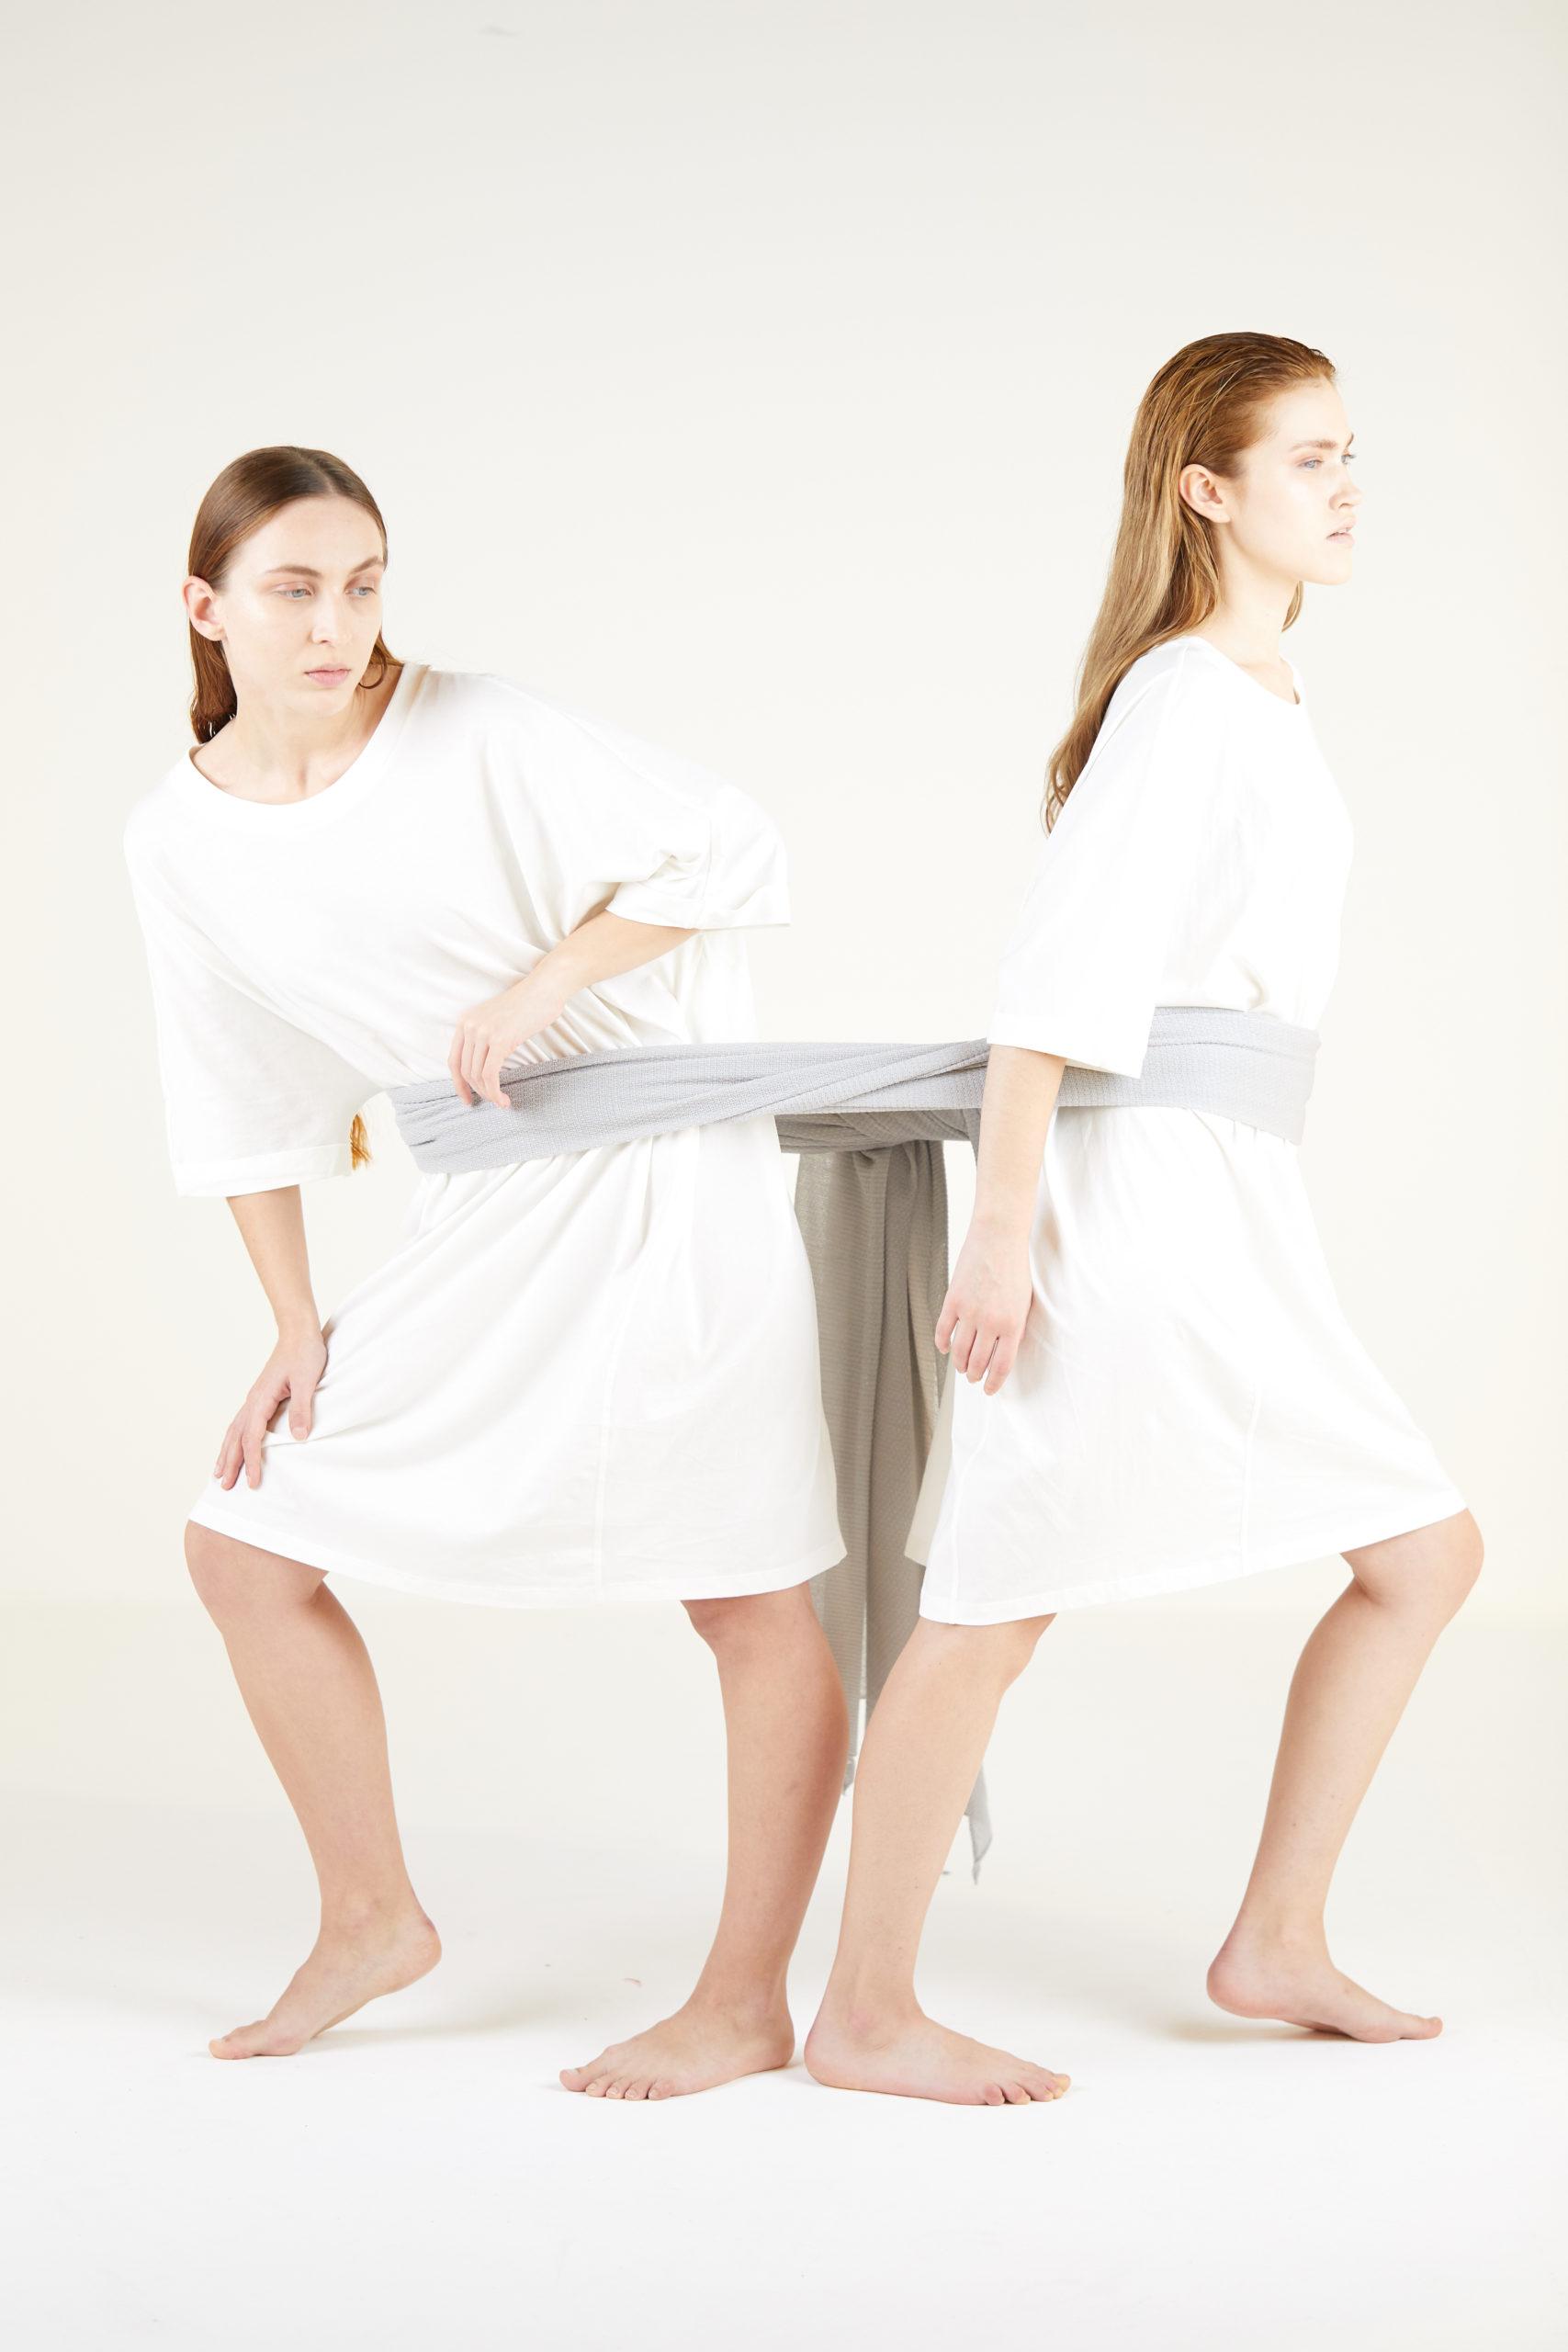 Zegna Baruffa video Woolmark la lana d'estate zin moda Biella video